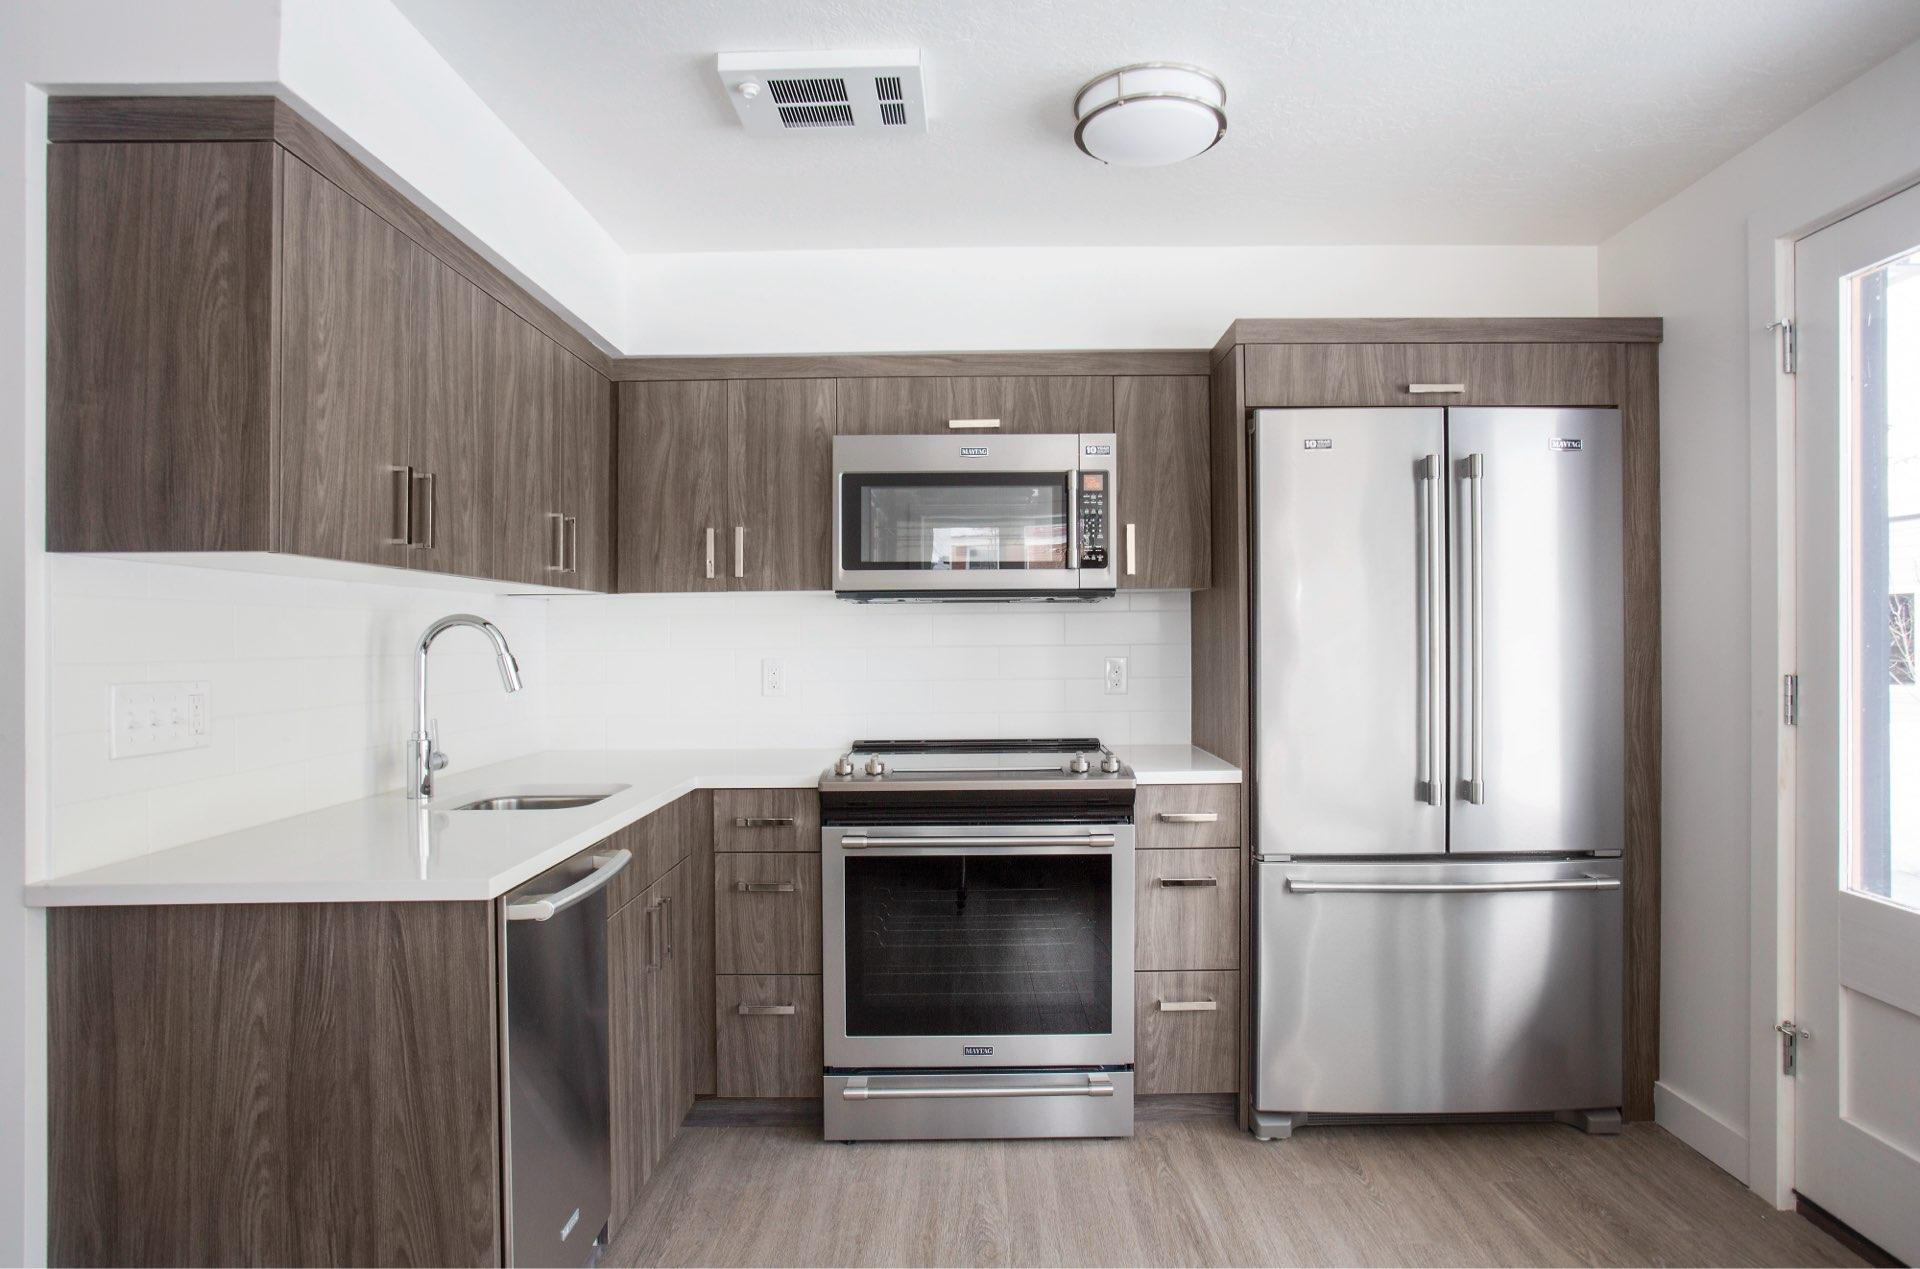 Kitchen, Woodside Park Affordable Housing, architectural design by Elliott Workgroup